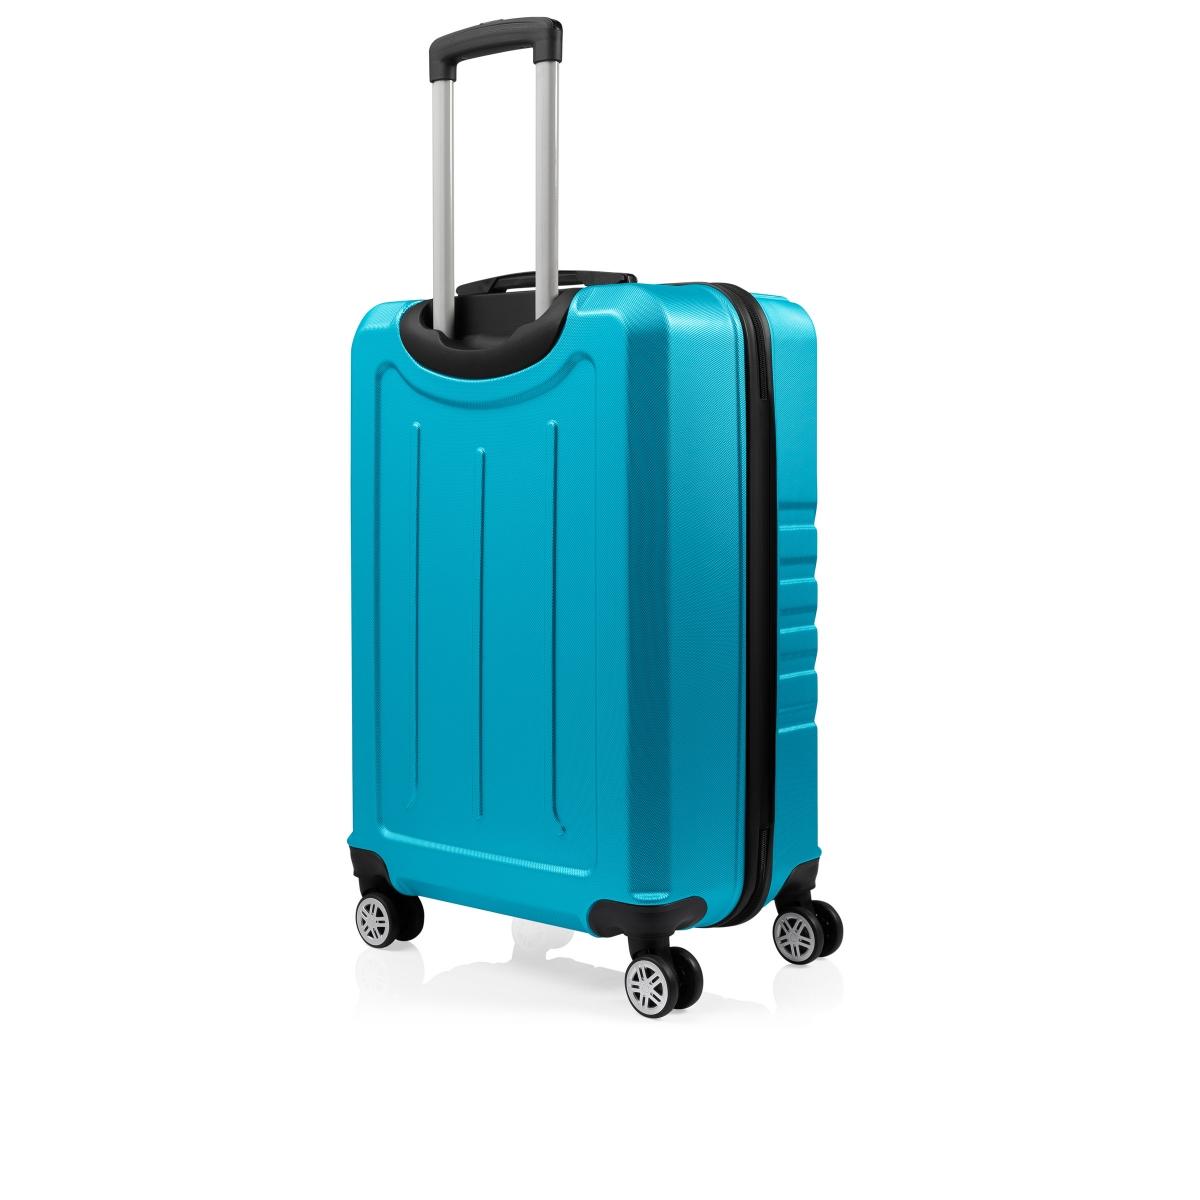 Gedox Abs 3'lü Valiz Seyahat Seti - Model:700.16 Turkuaz